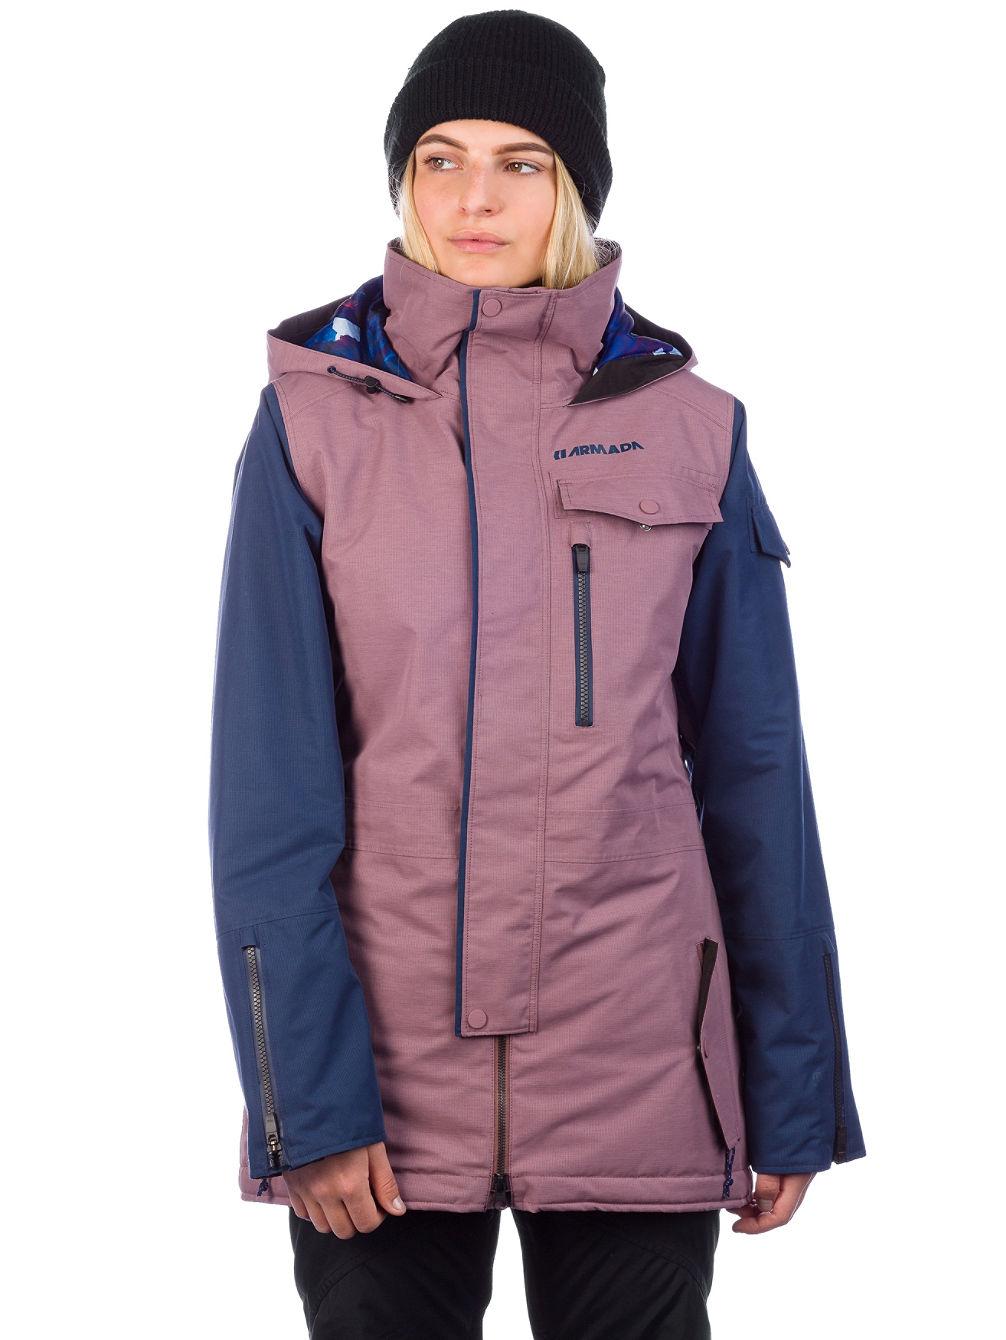 Buy Armada Kana Gore-Tex Insulated Jacket online at blue-tomato.com fa71f00cd